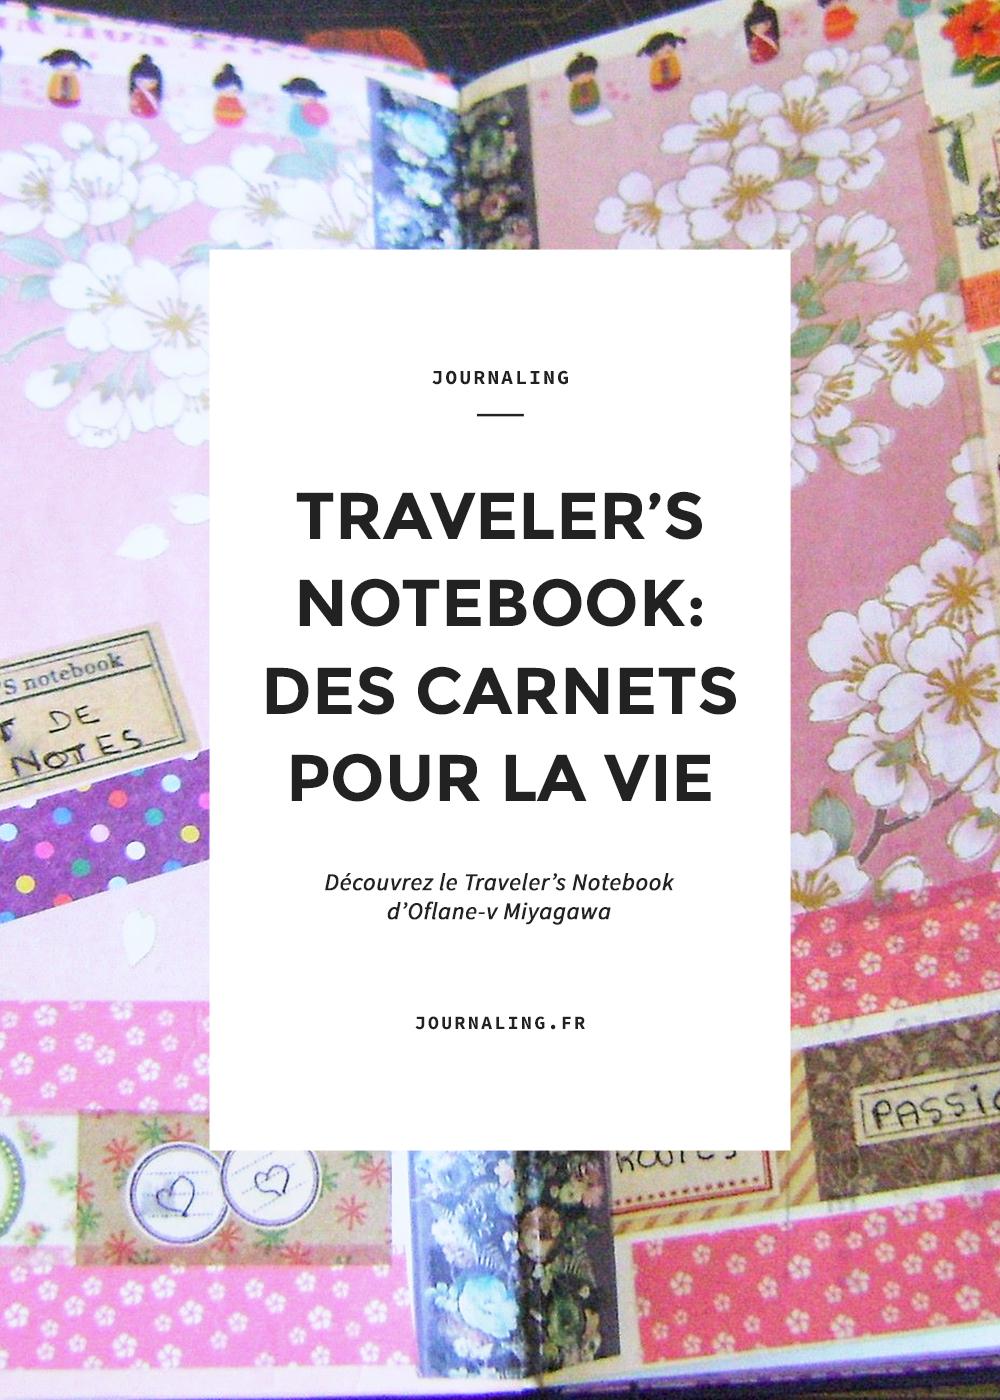 Carnet Midori: le Traveler's Notebook d'Oflane-v Miyagawa